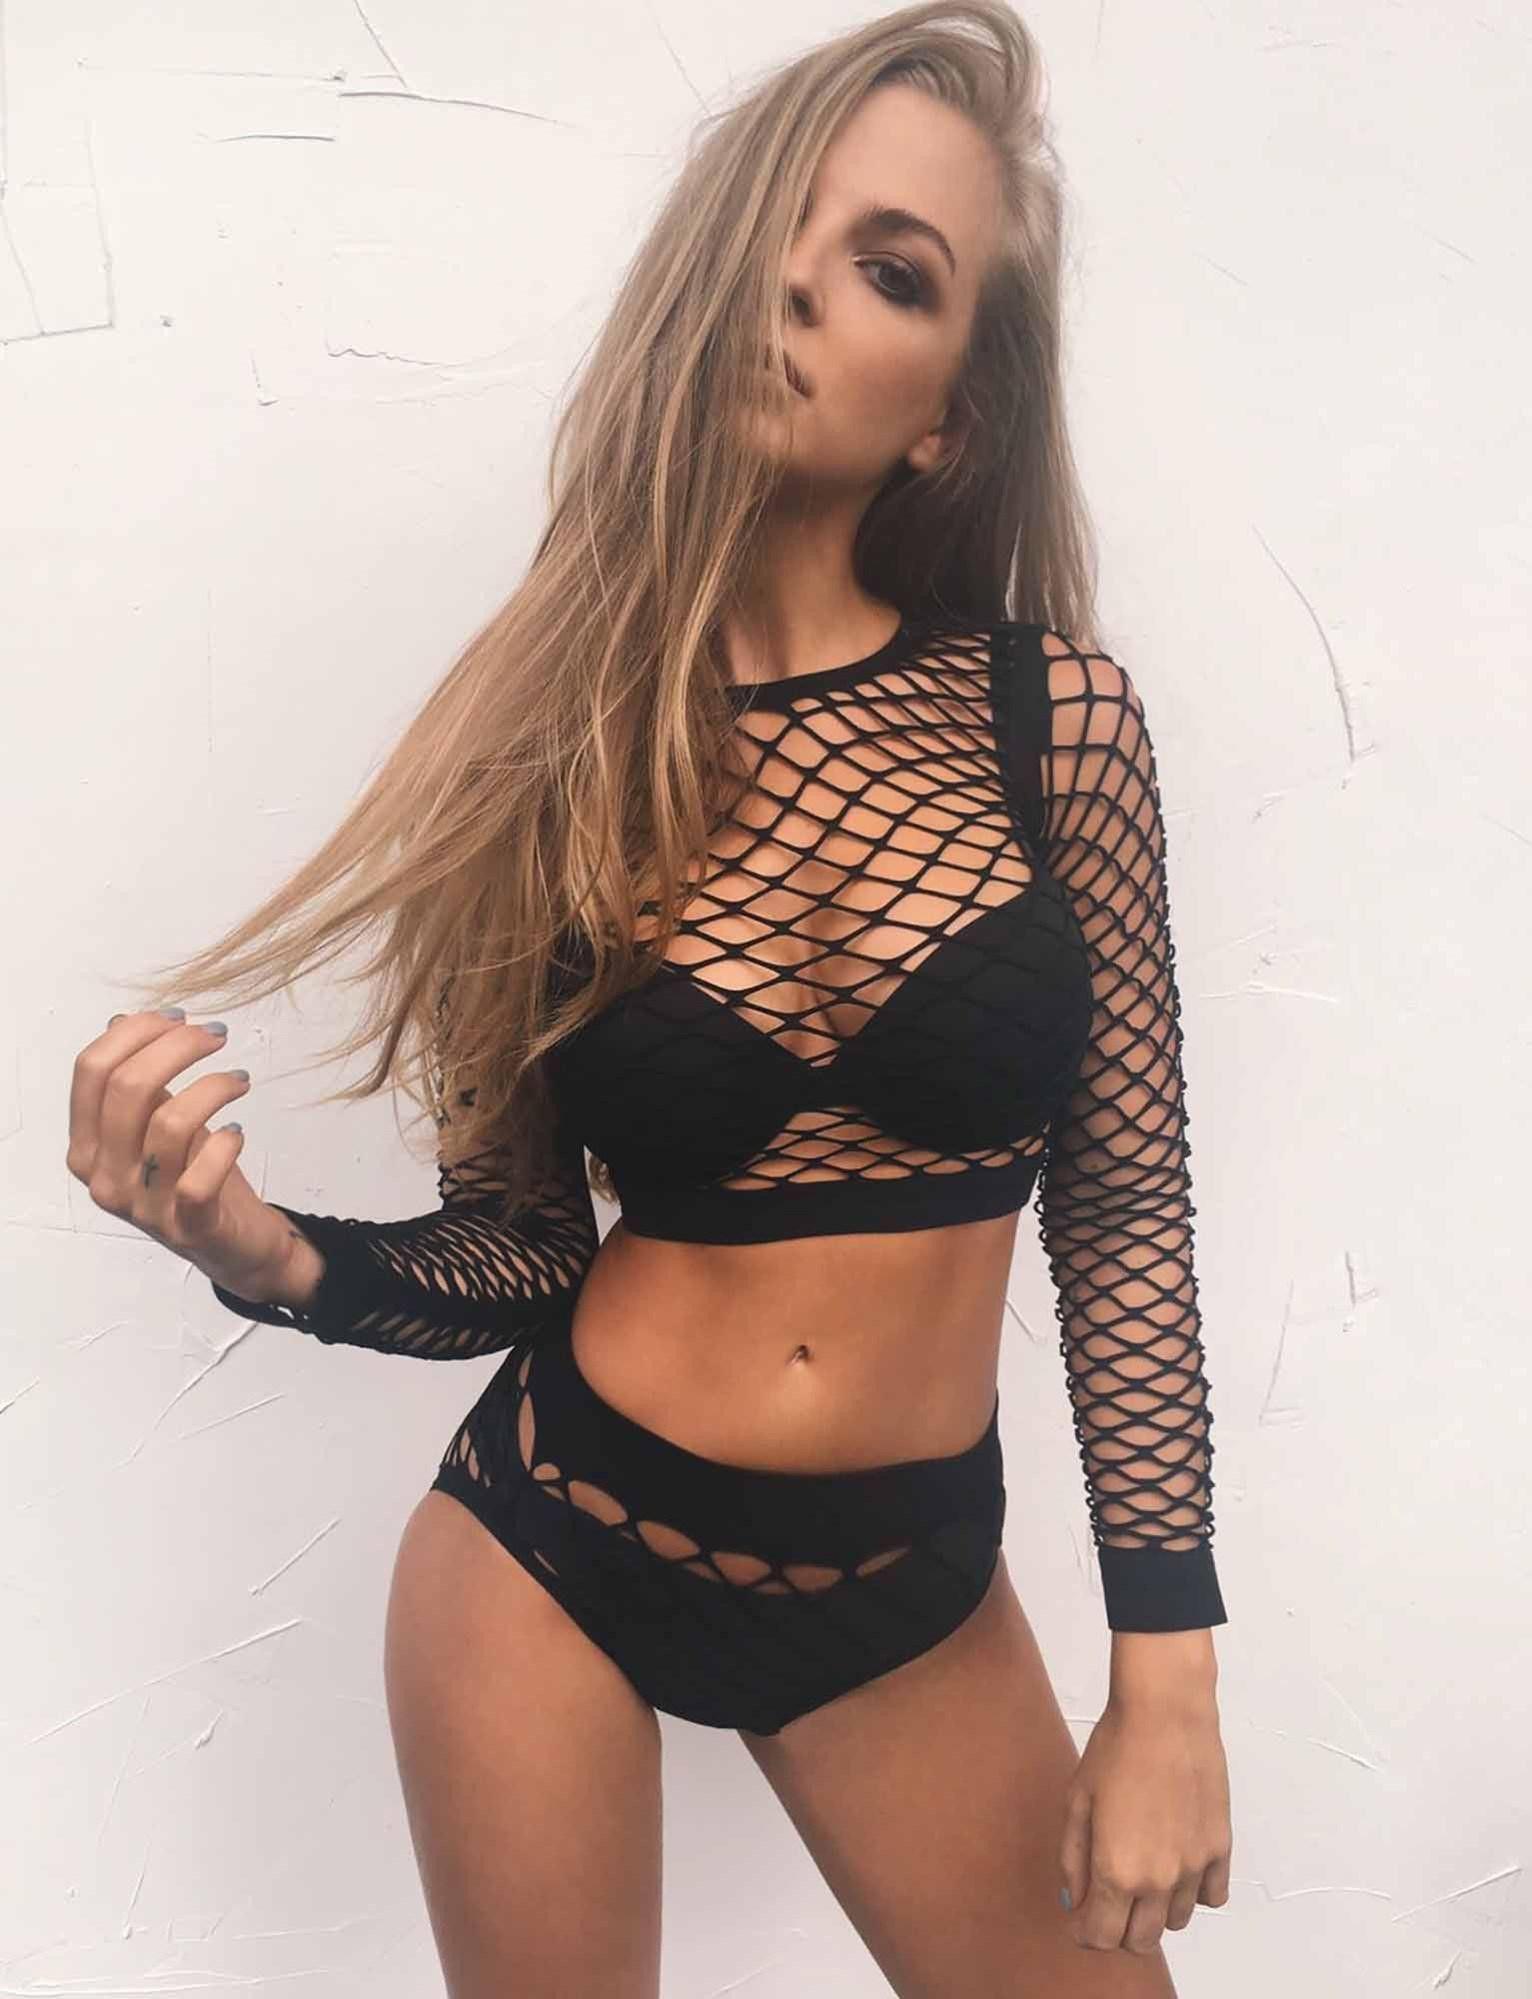 622563ab68 Two Piece Set Women Sexy Lingerie Black Mesh Long Sleeve Crop Top Underwear  Summer Party Beach Clothing Short Sets LF099-519